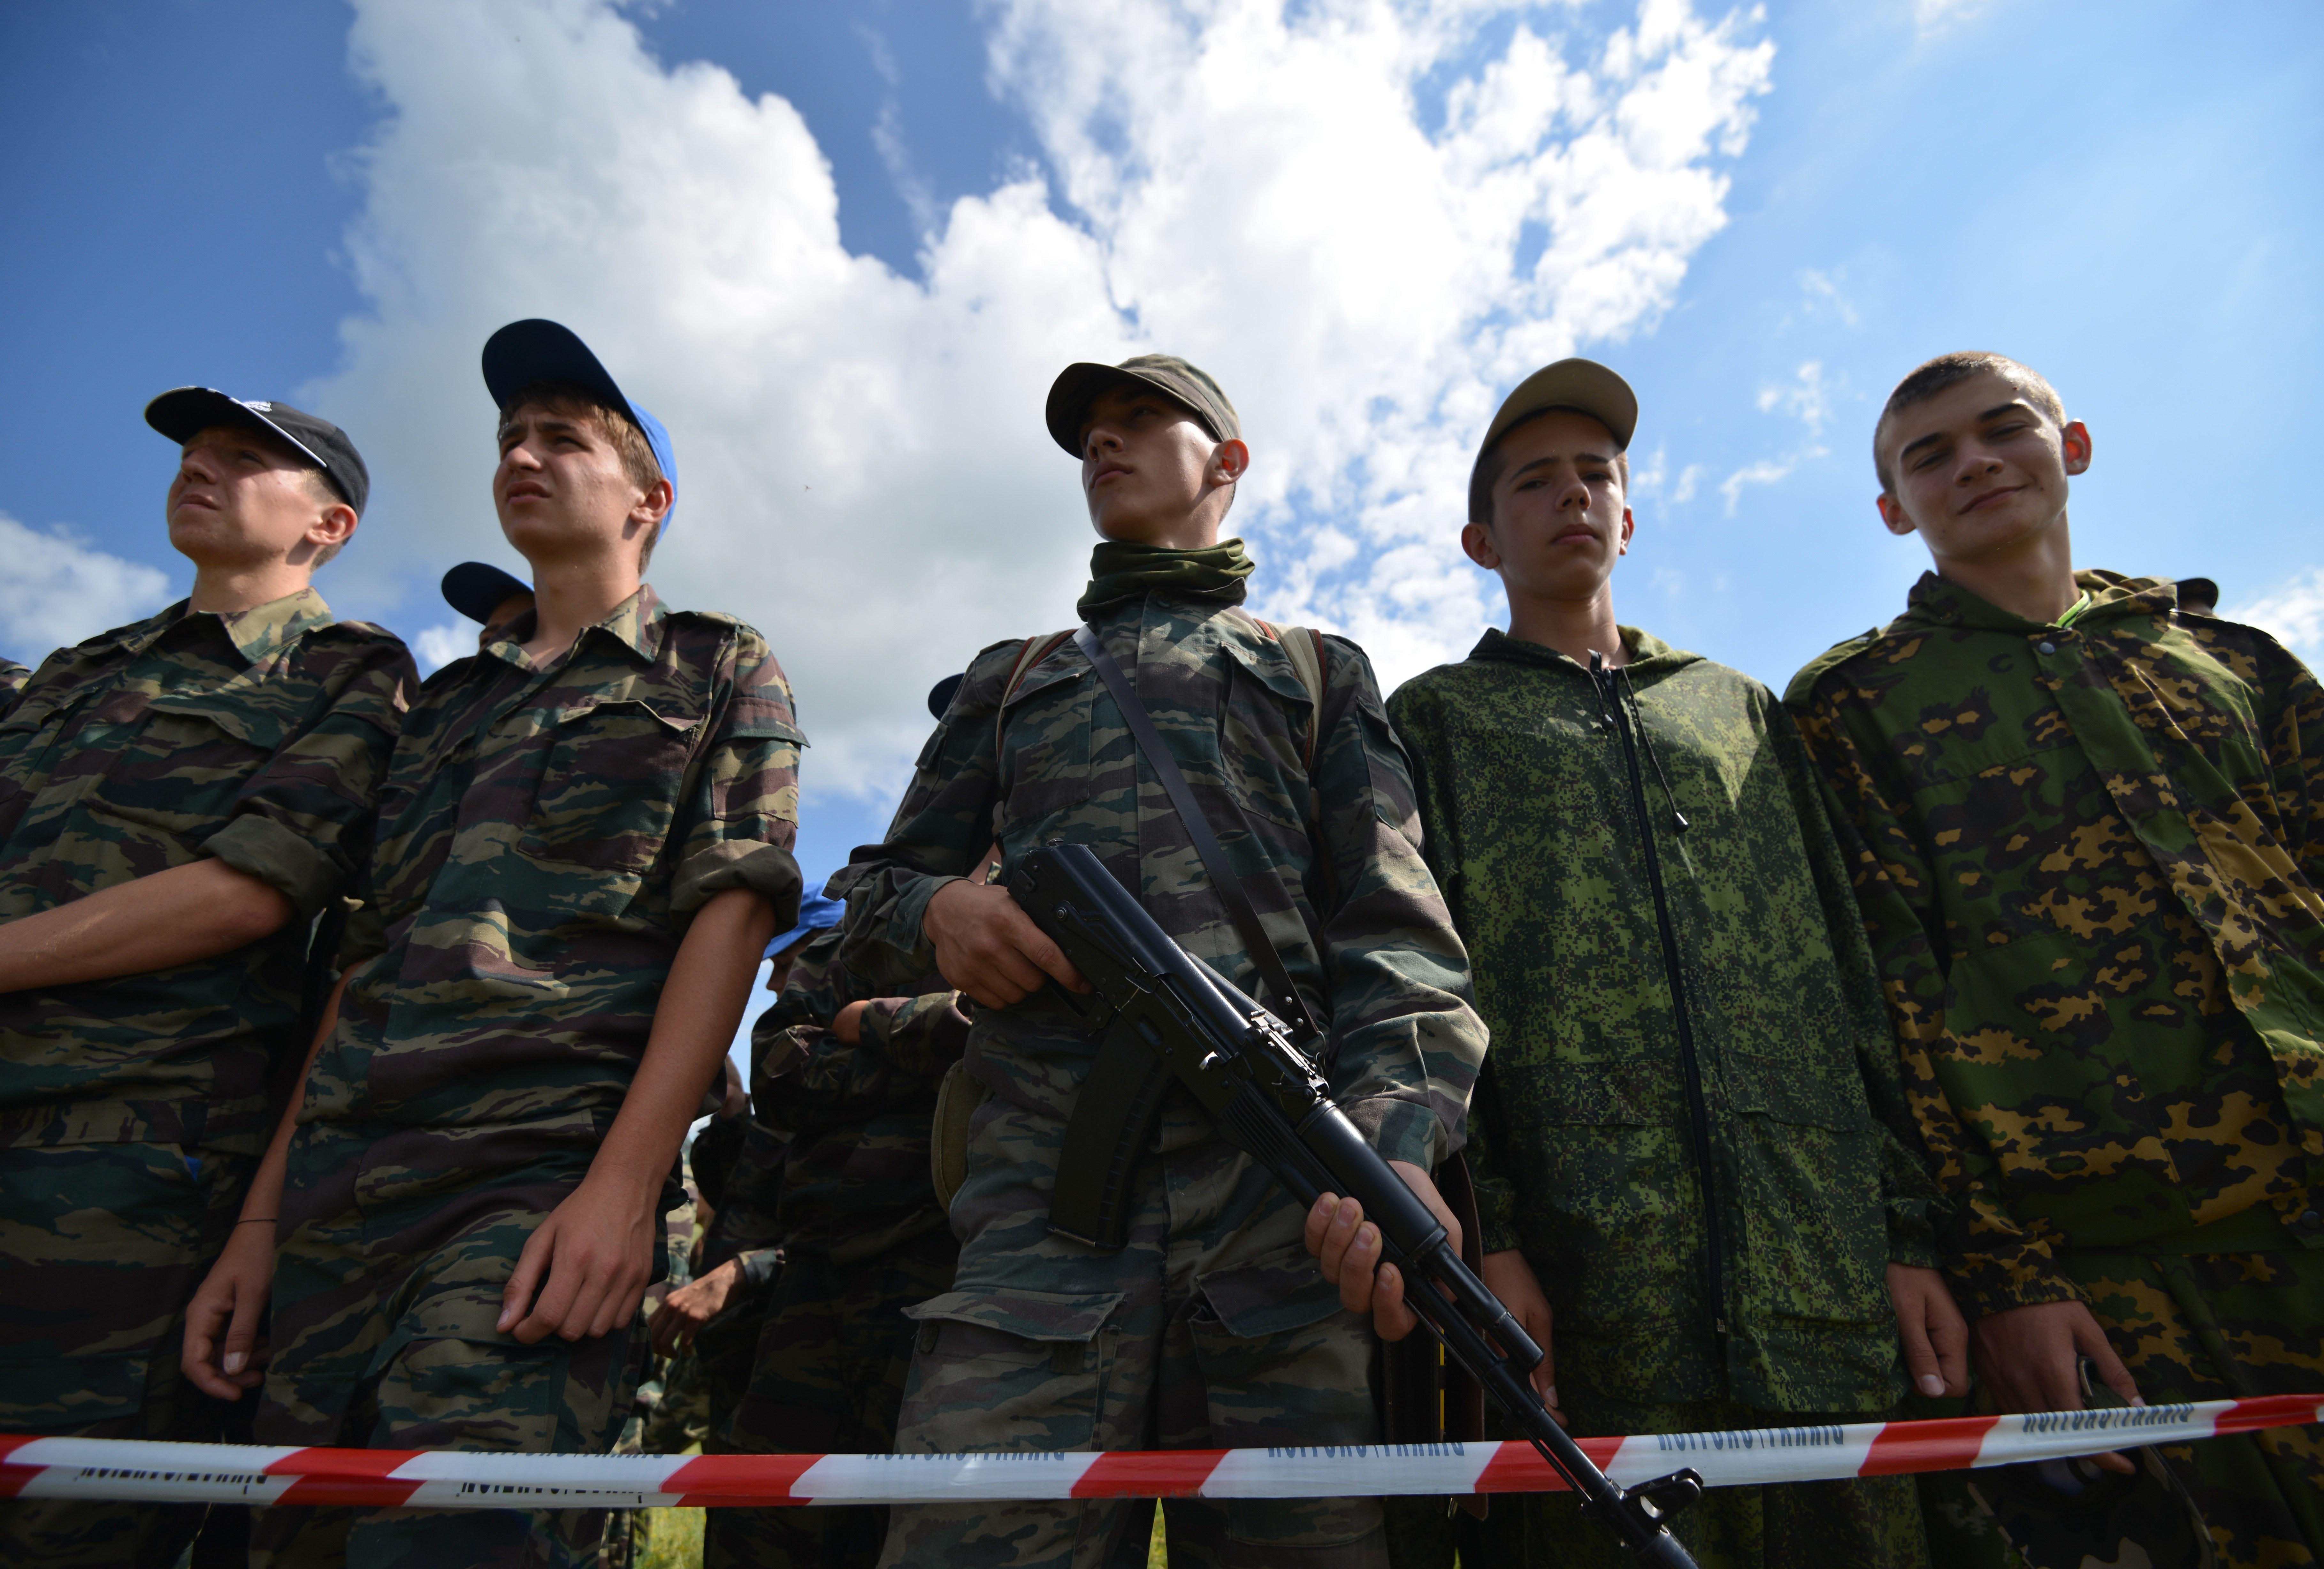 RUSSIA-TEENAGERS-MILITARY-PATRIOTIC-GAME